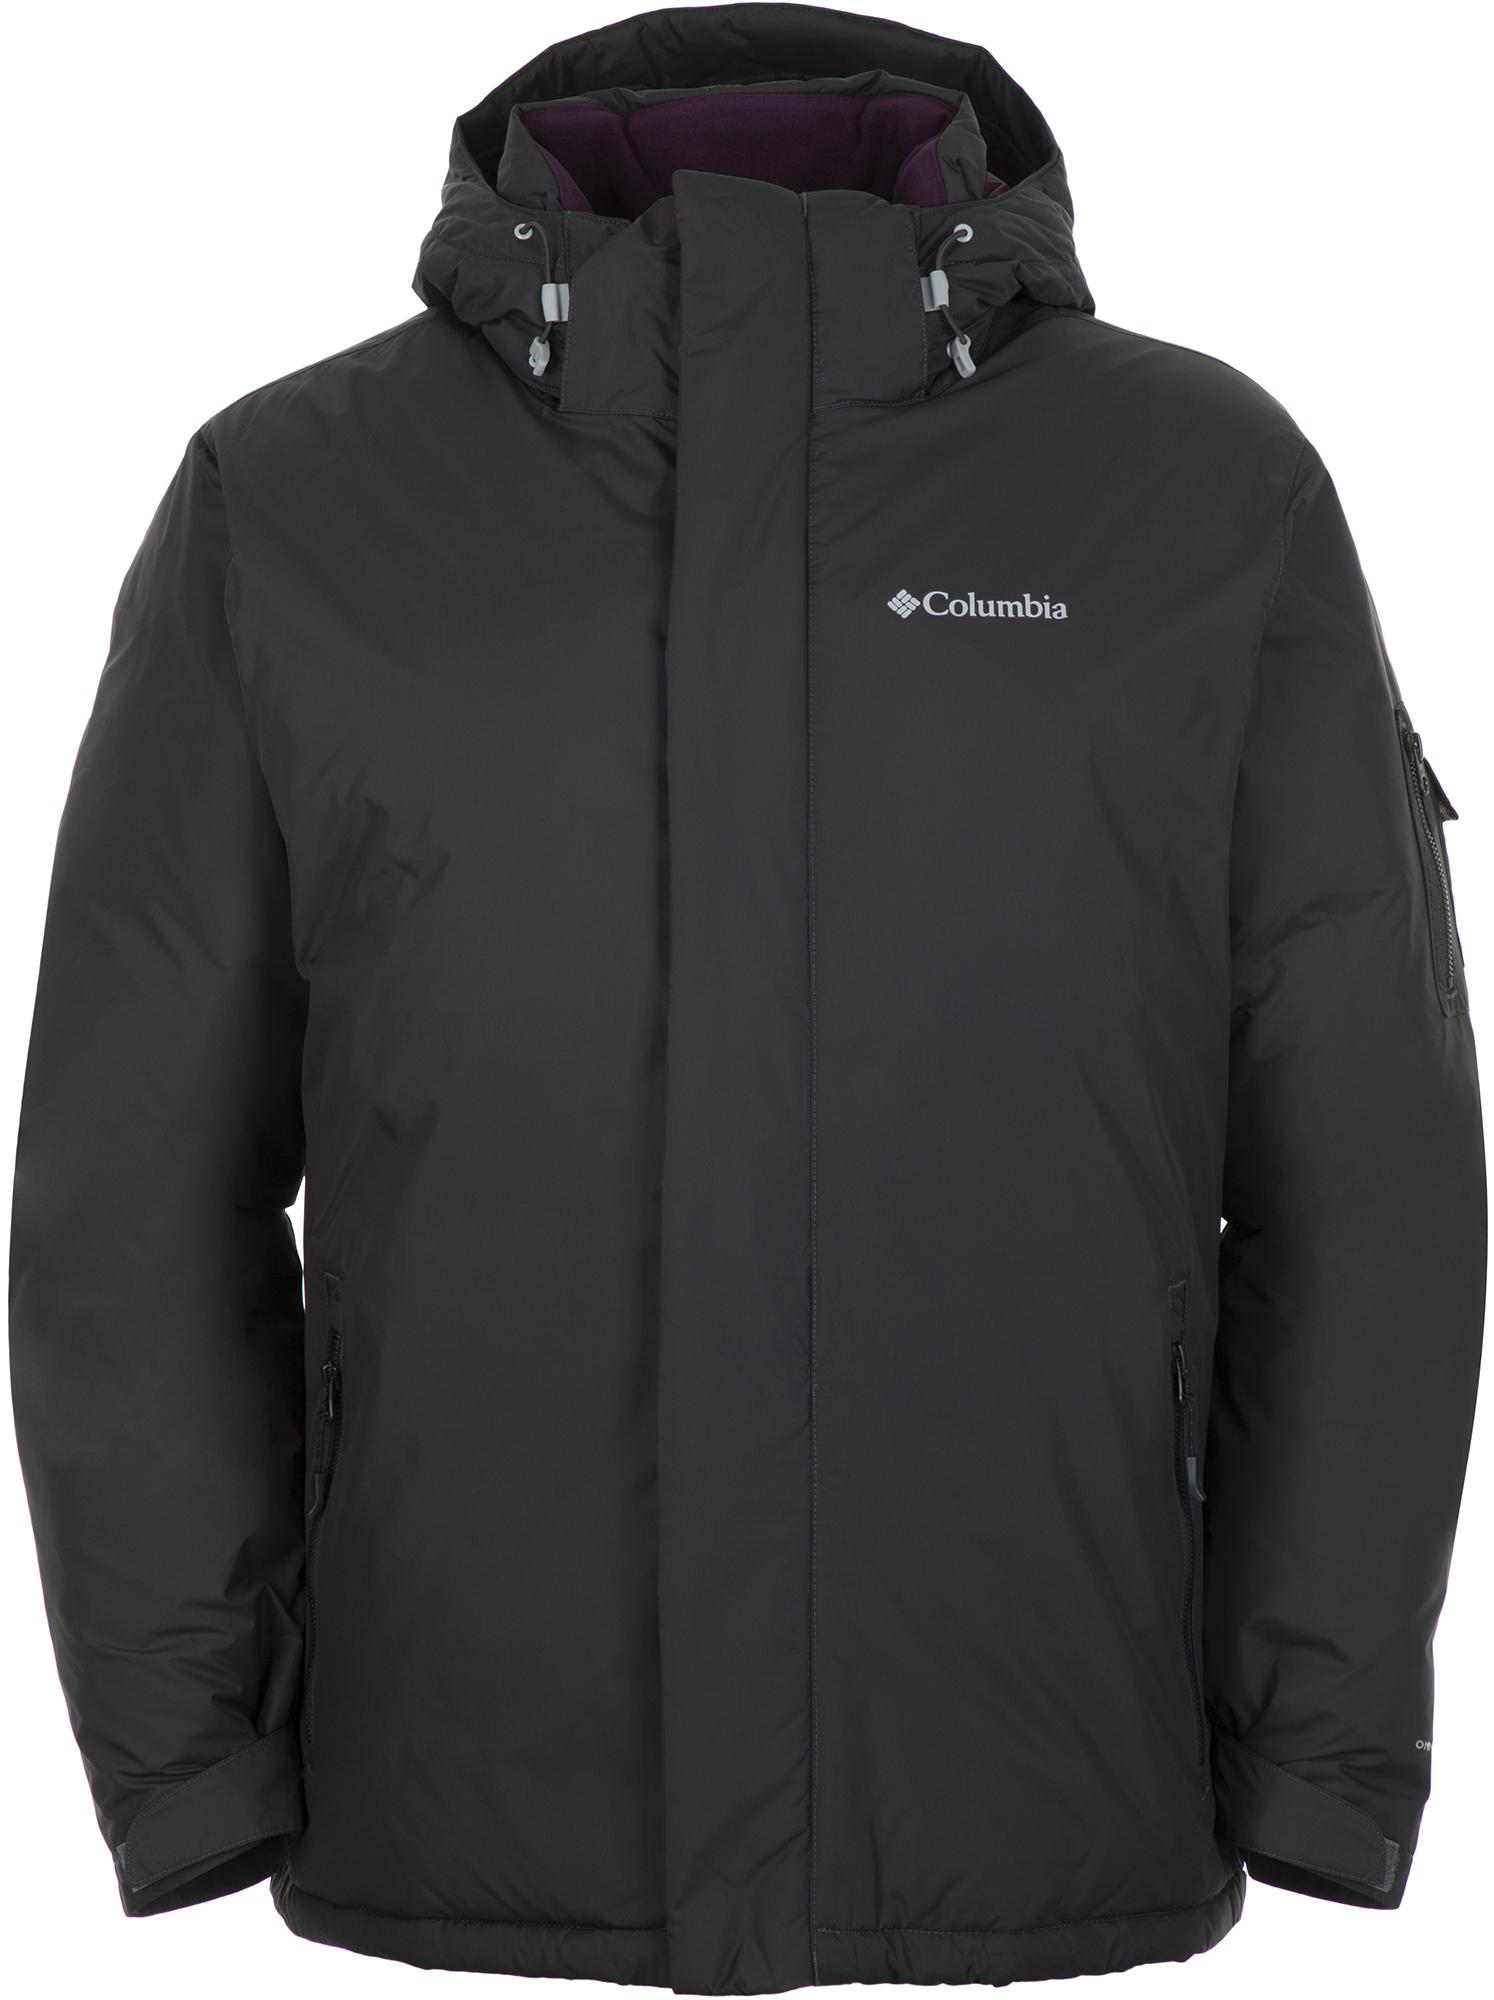 Columbia Куртка пуховая мужская Wildhorse Crest II, размер 50-52